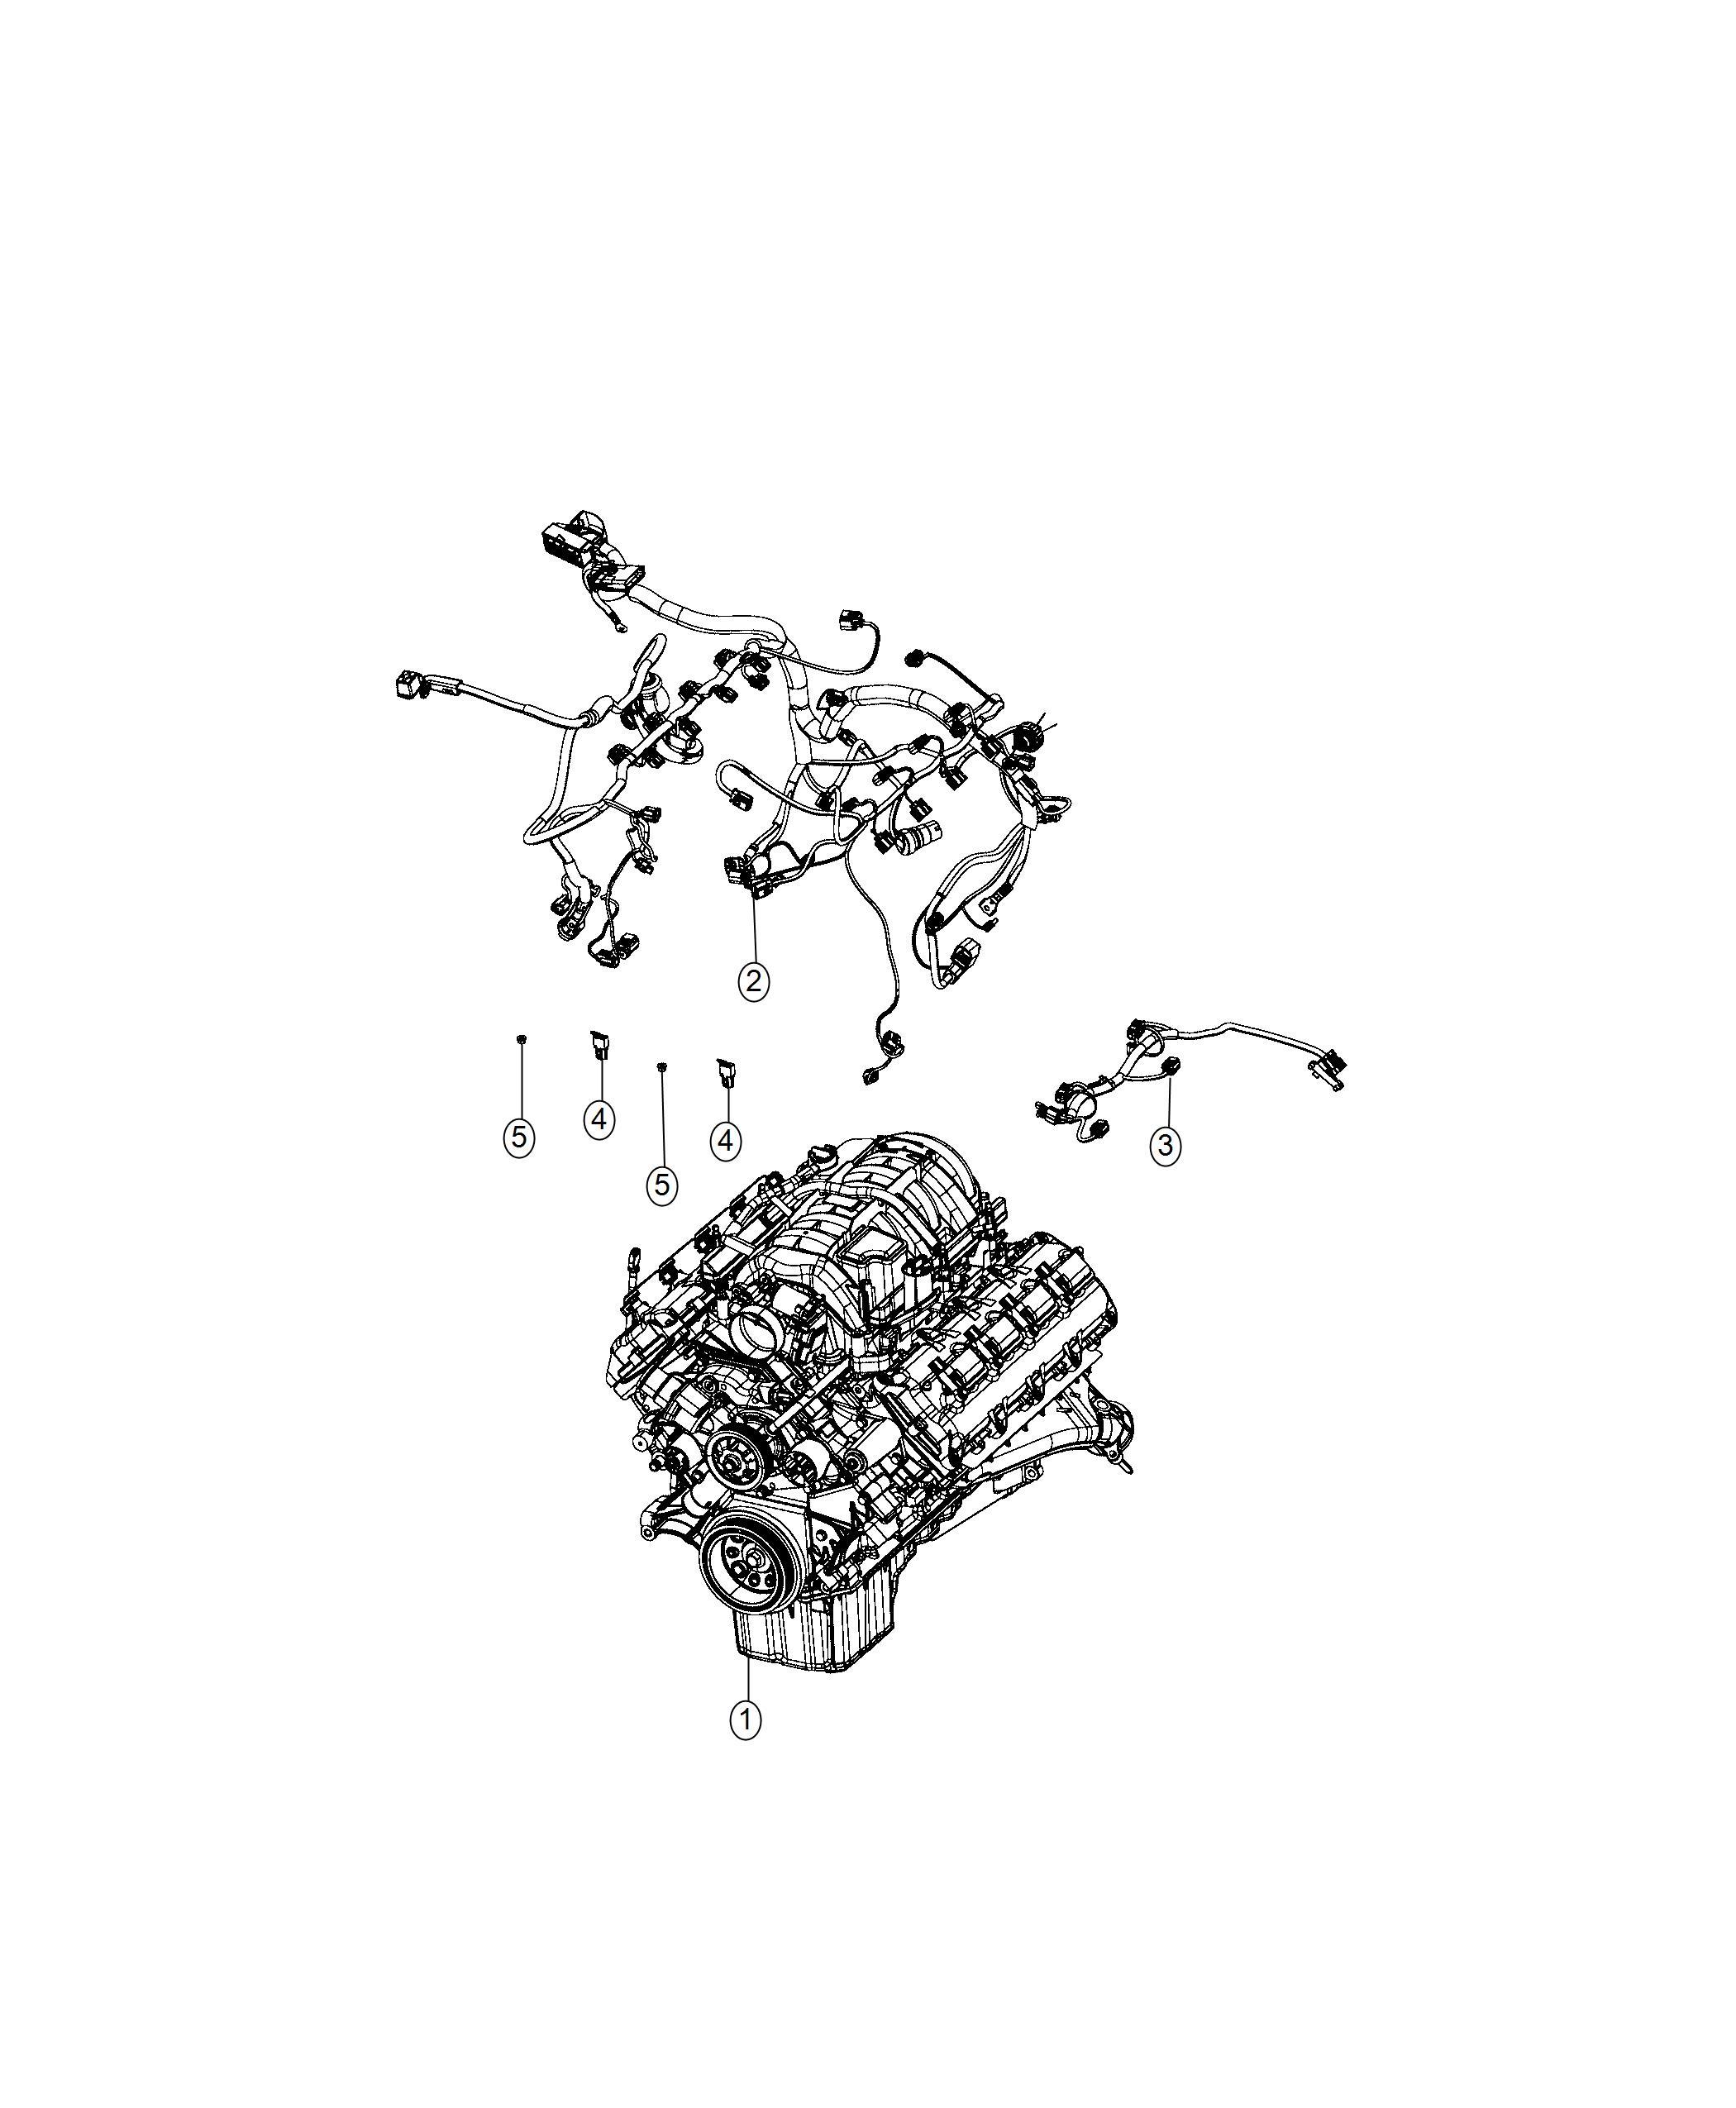 Chrysler 300 Wiring Engine Powertrain Fca Electrical